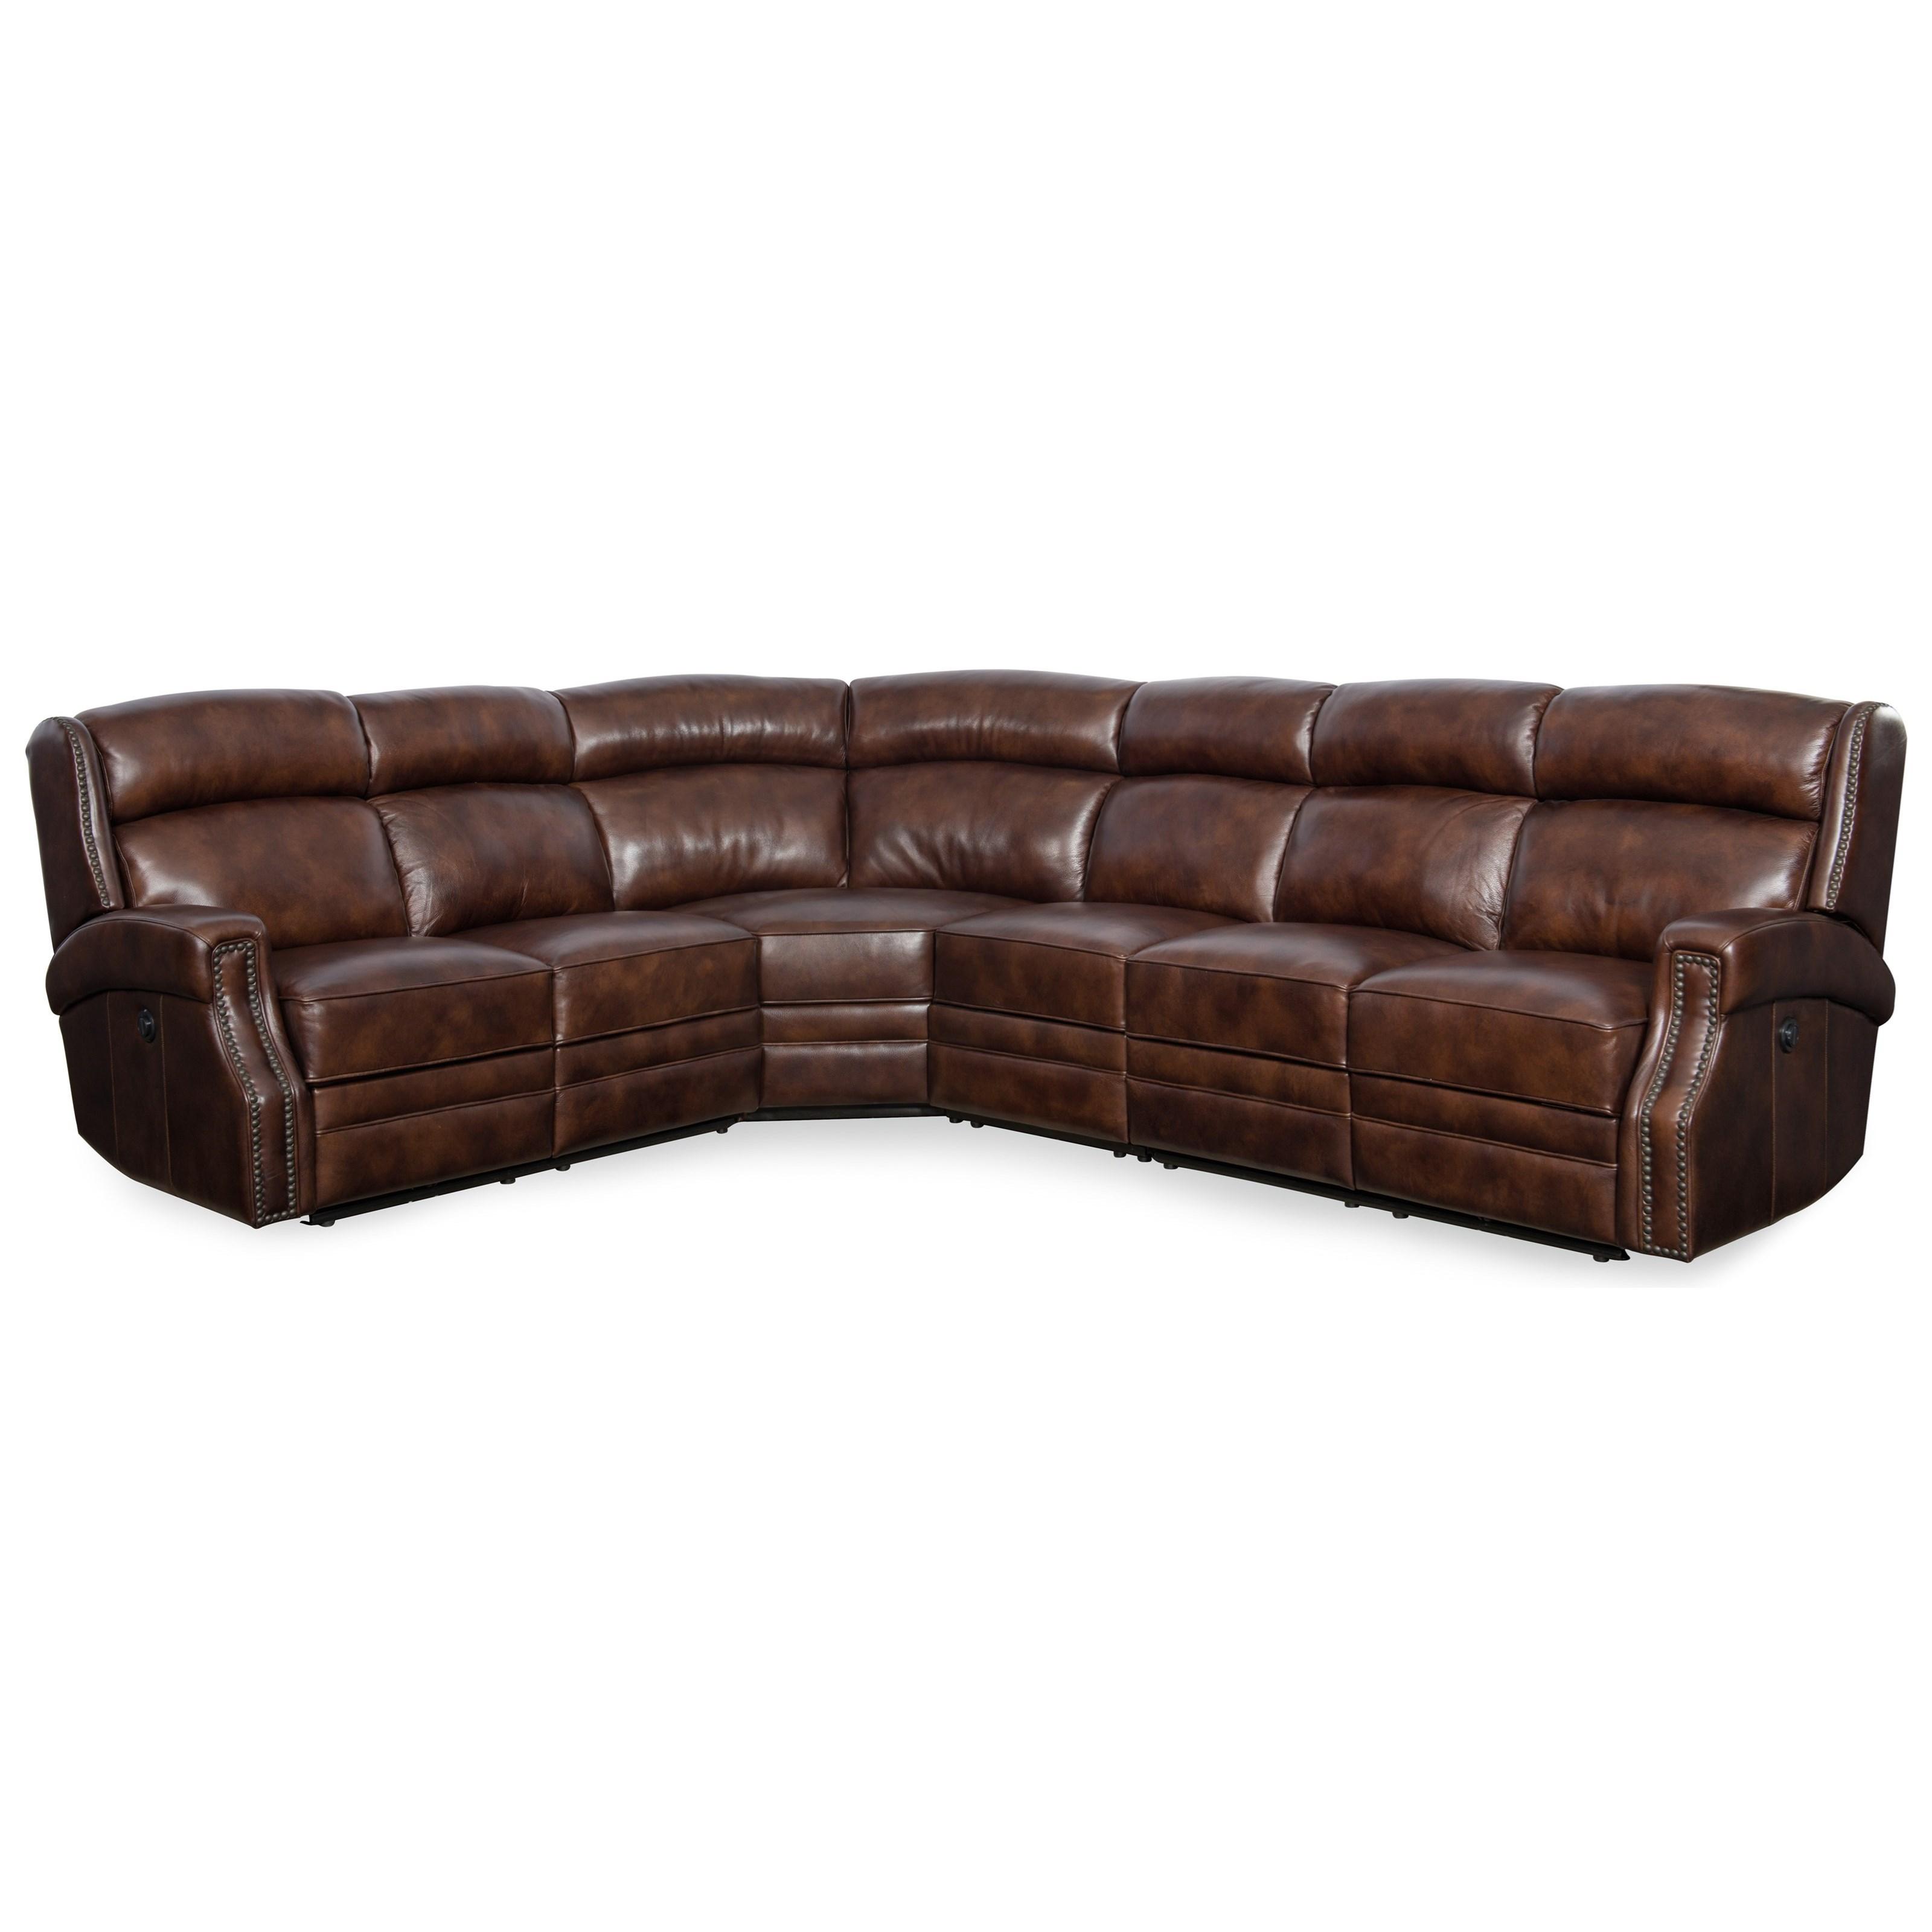 Carlisle RAF Power Motion Loveseat w/Pwr Headrest by Hooker Furniture at Baer's Furniture